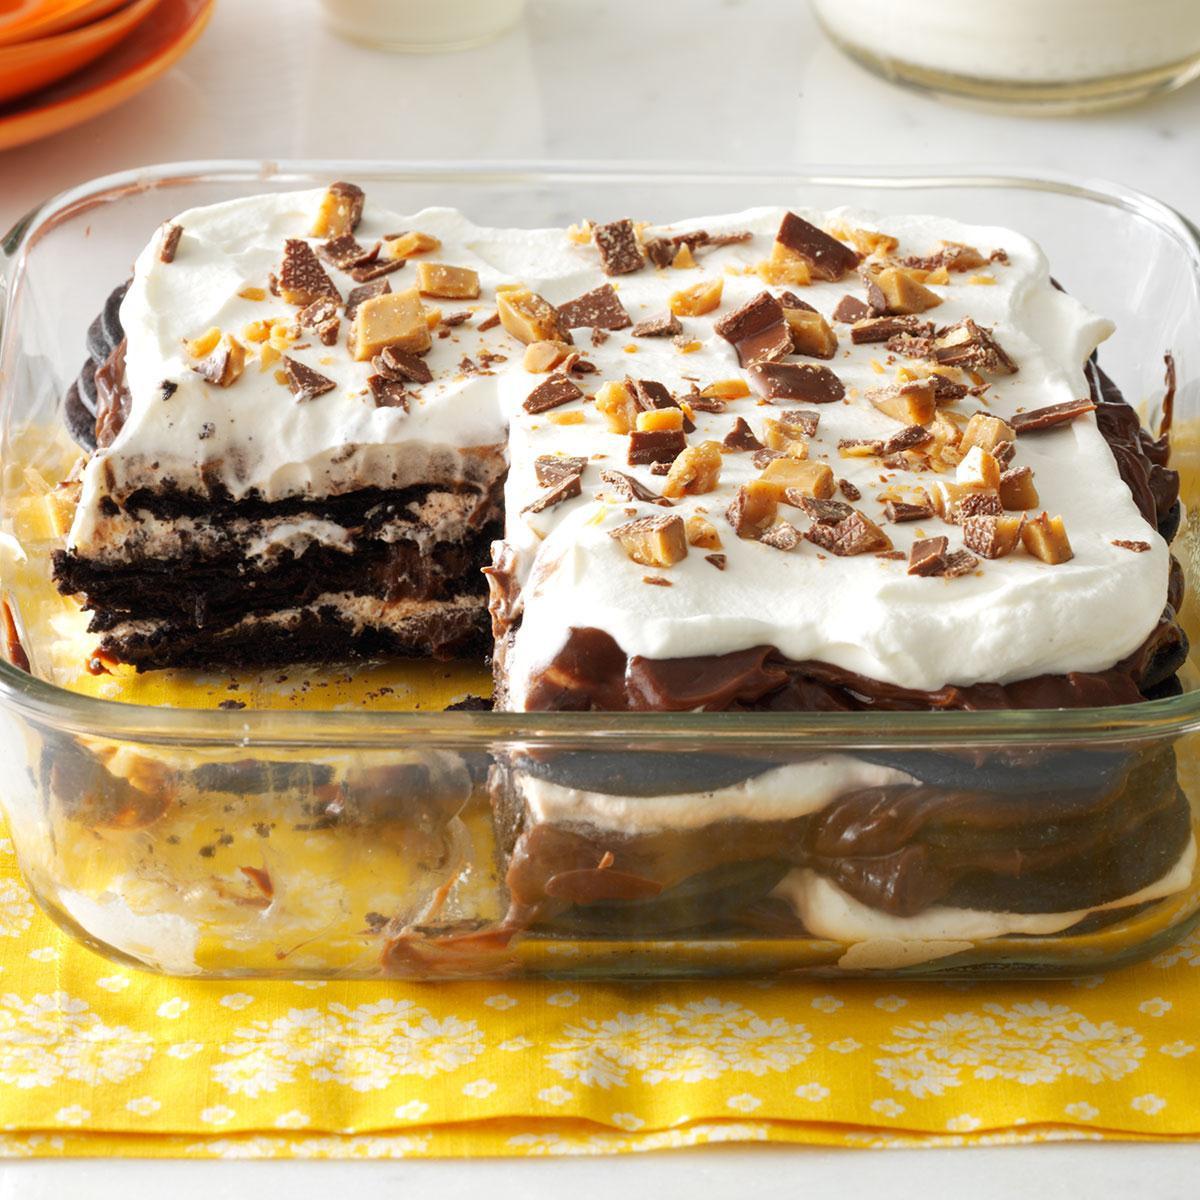 Easy Chocolate Desserts  Double Chocolate Toffee Icebox Cake Recipe